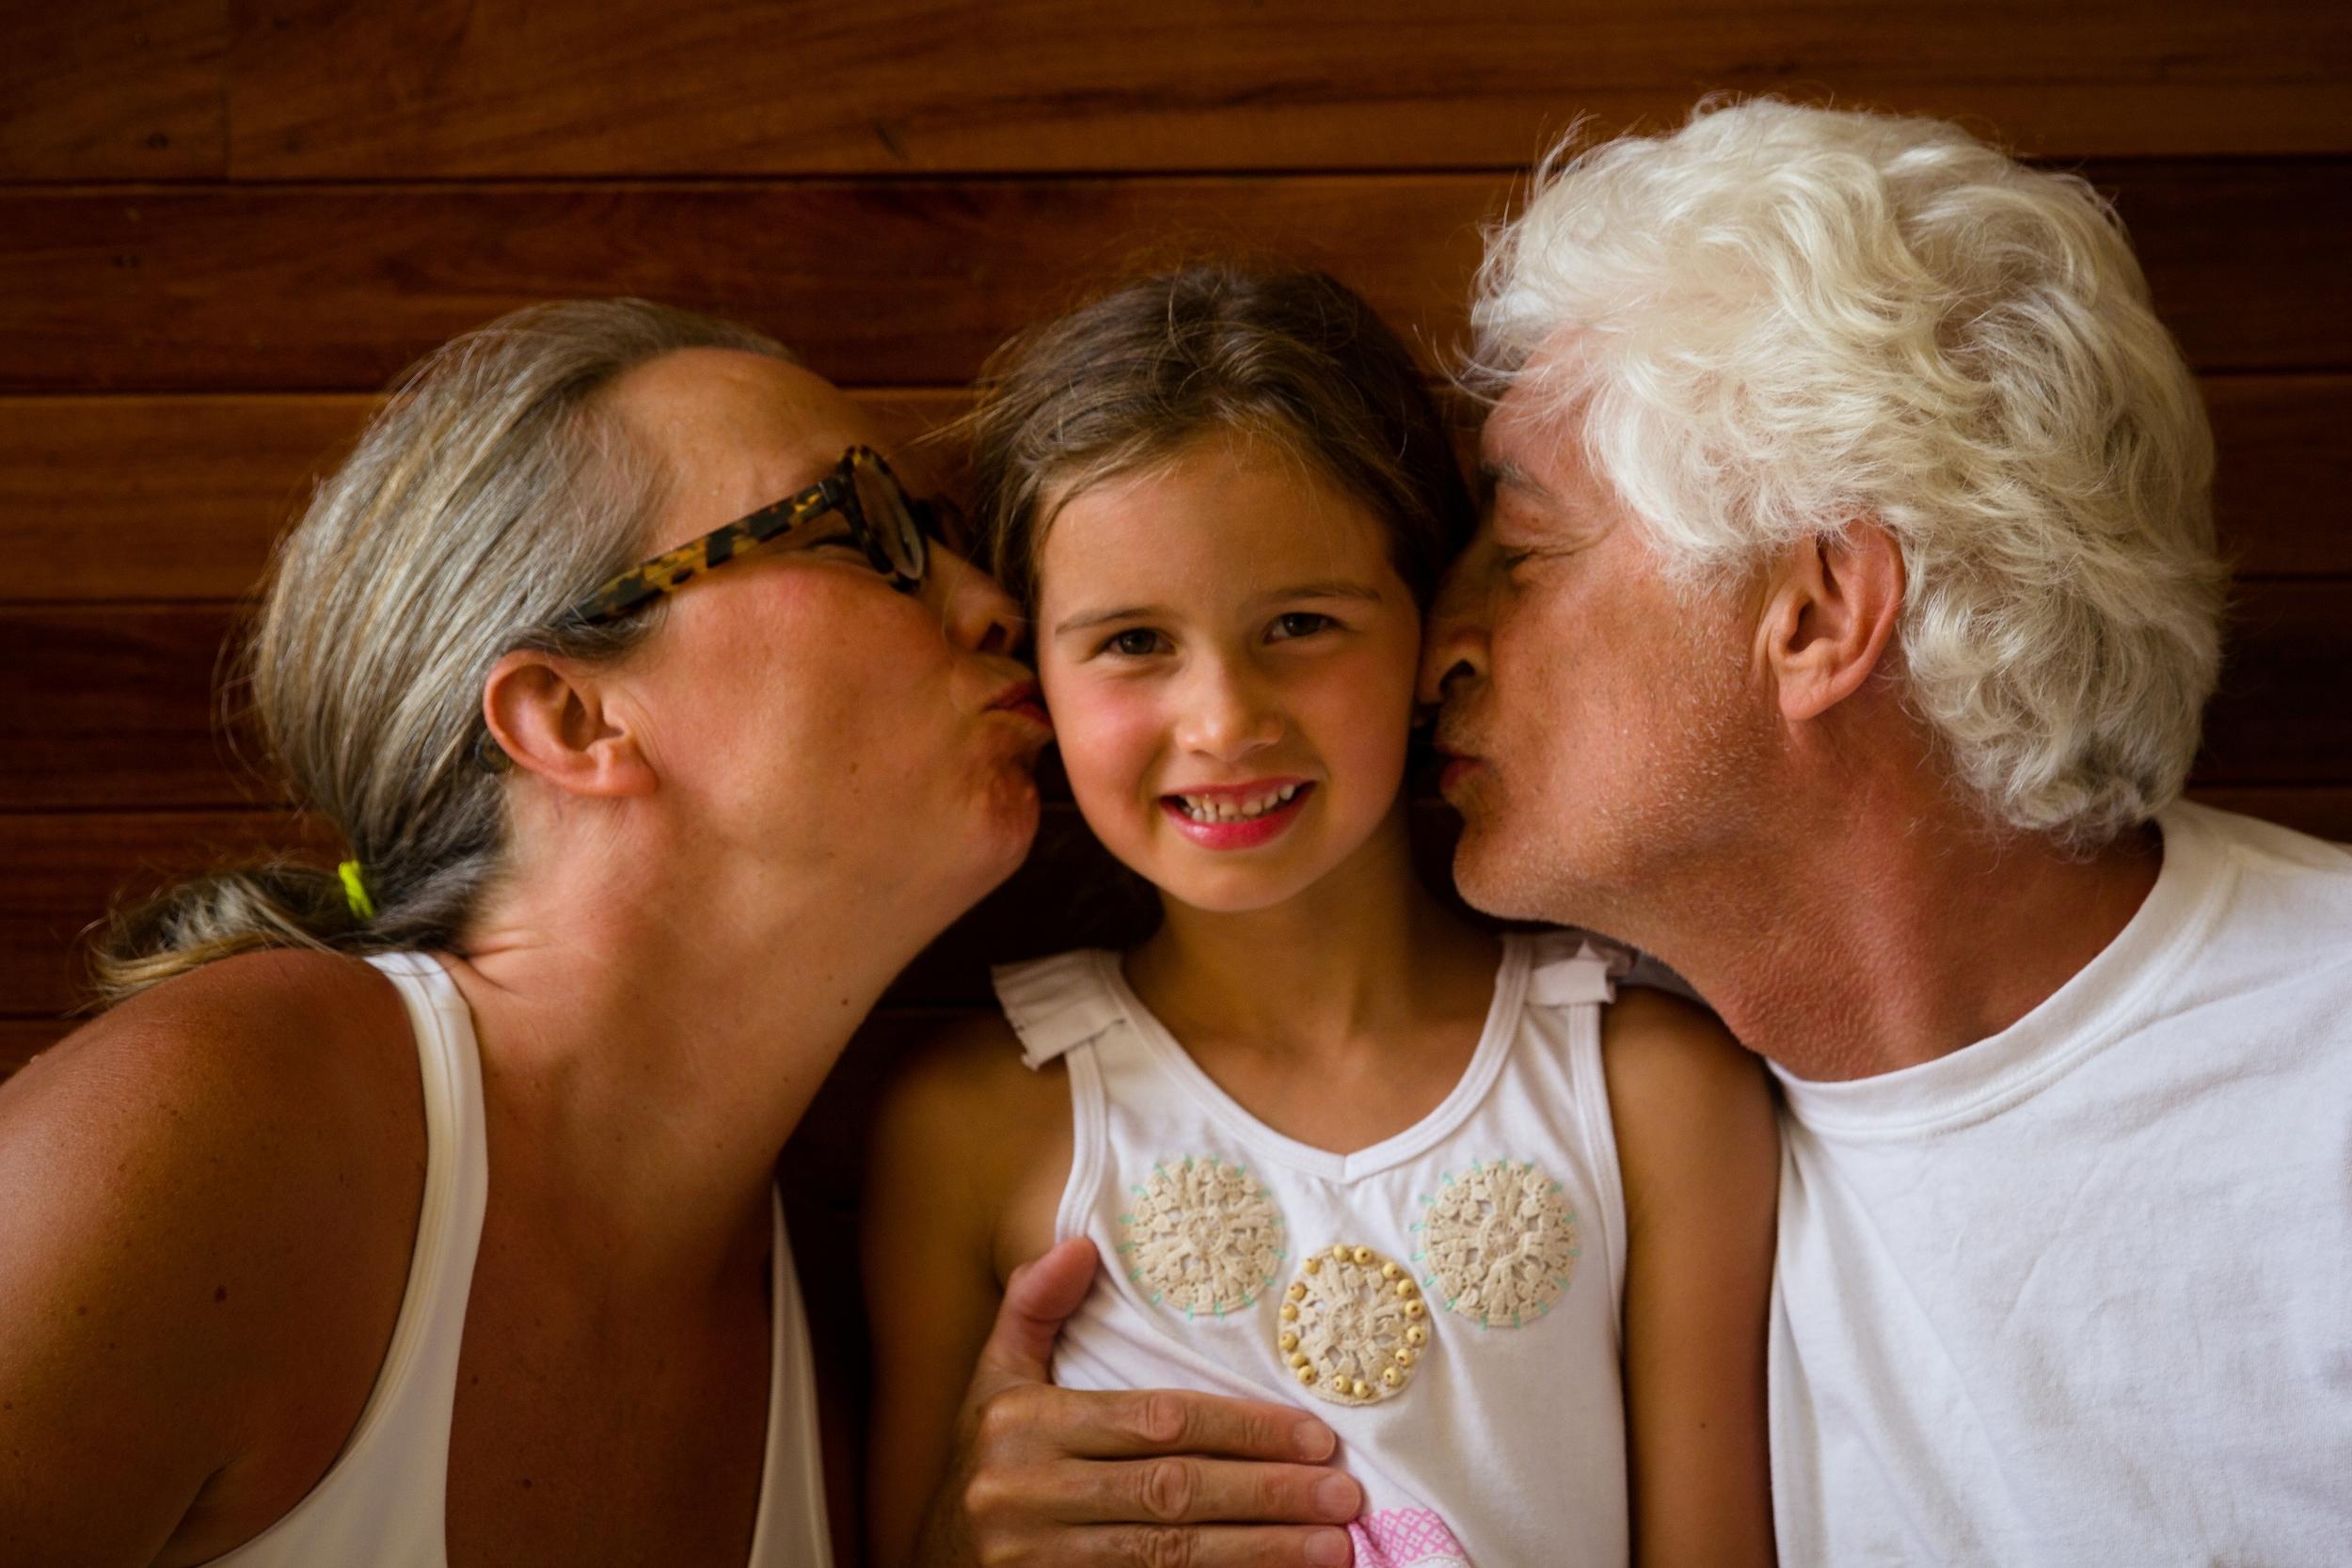 Love your family! xoxox